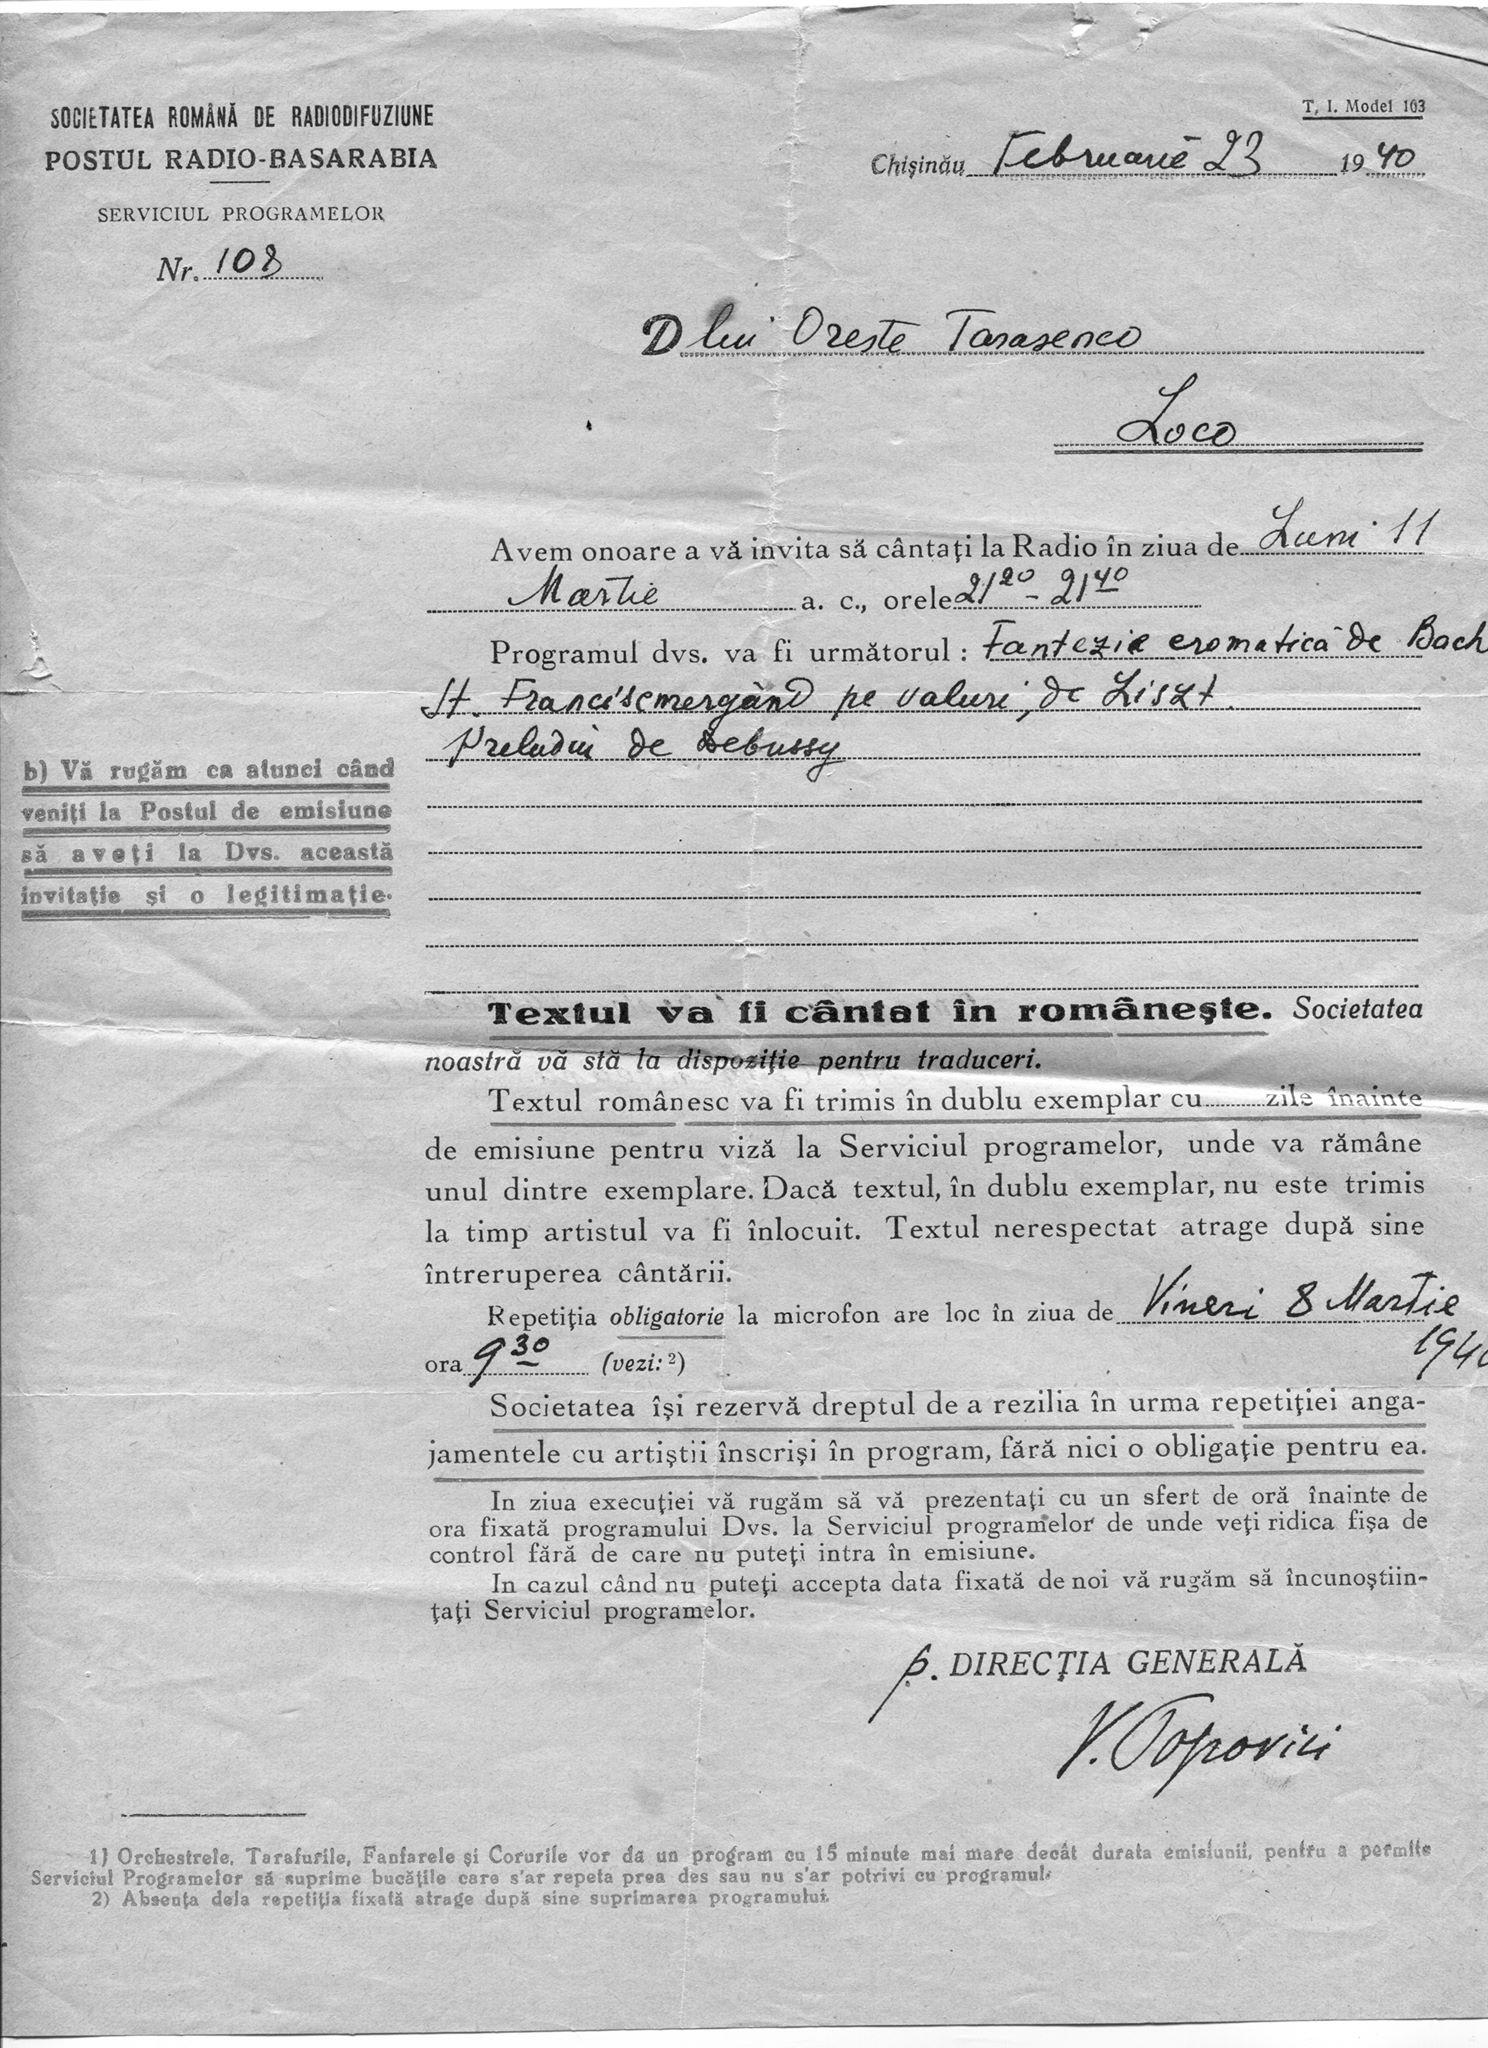 Письмо Оресту Тарасенко. Радио-Басарабия, 23 февраля 1940 / Из семейного архива Вадима Рогалина